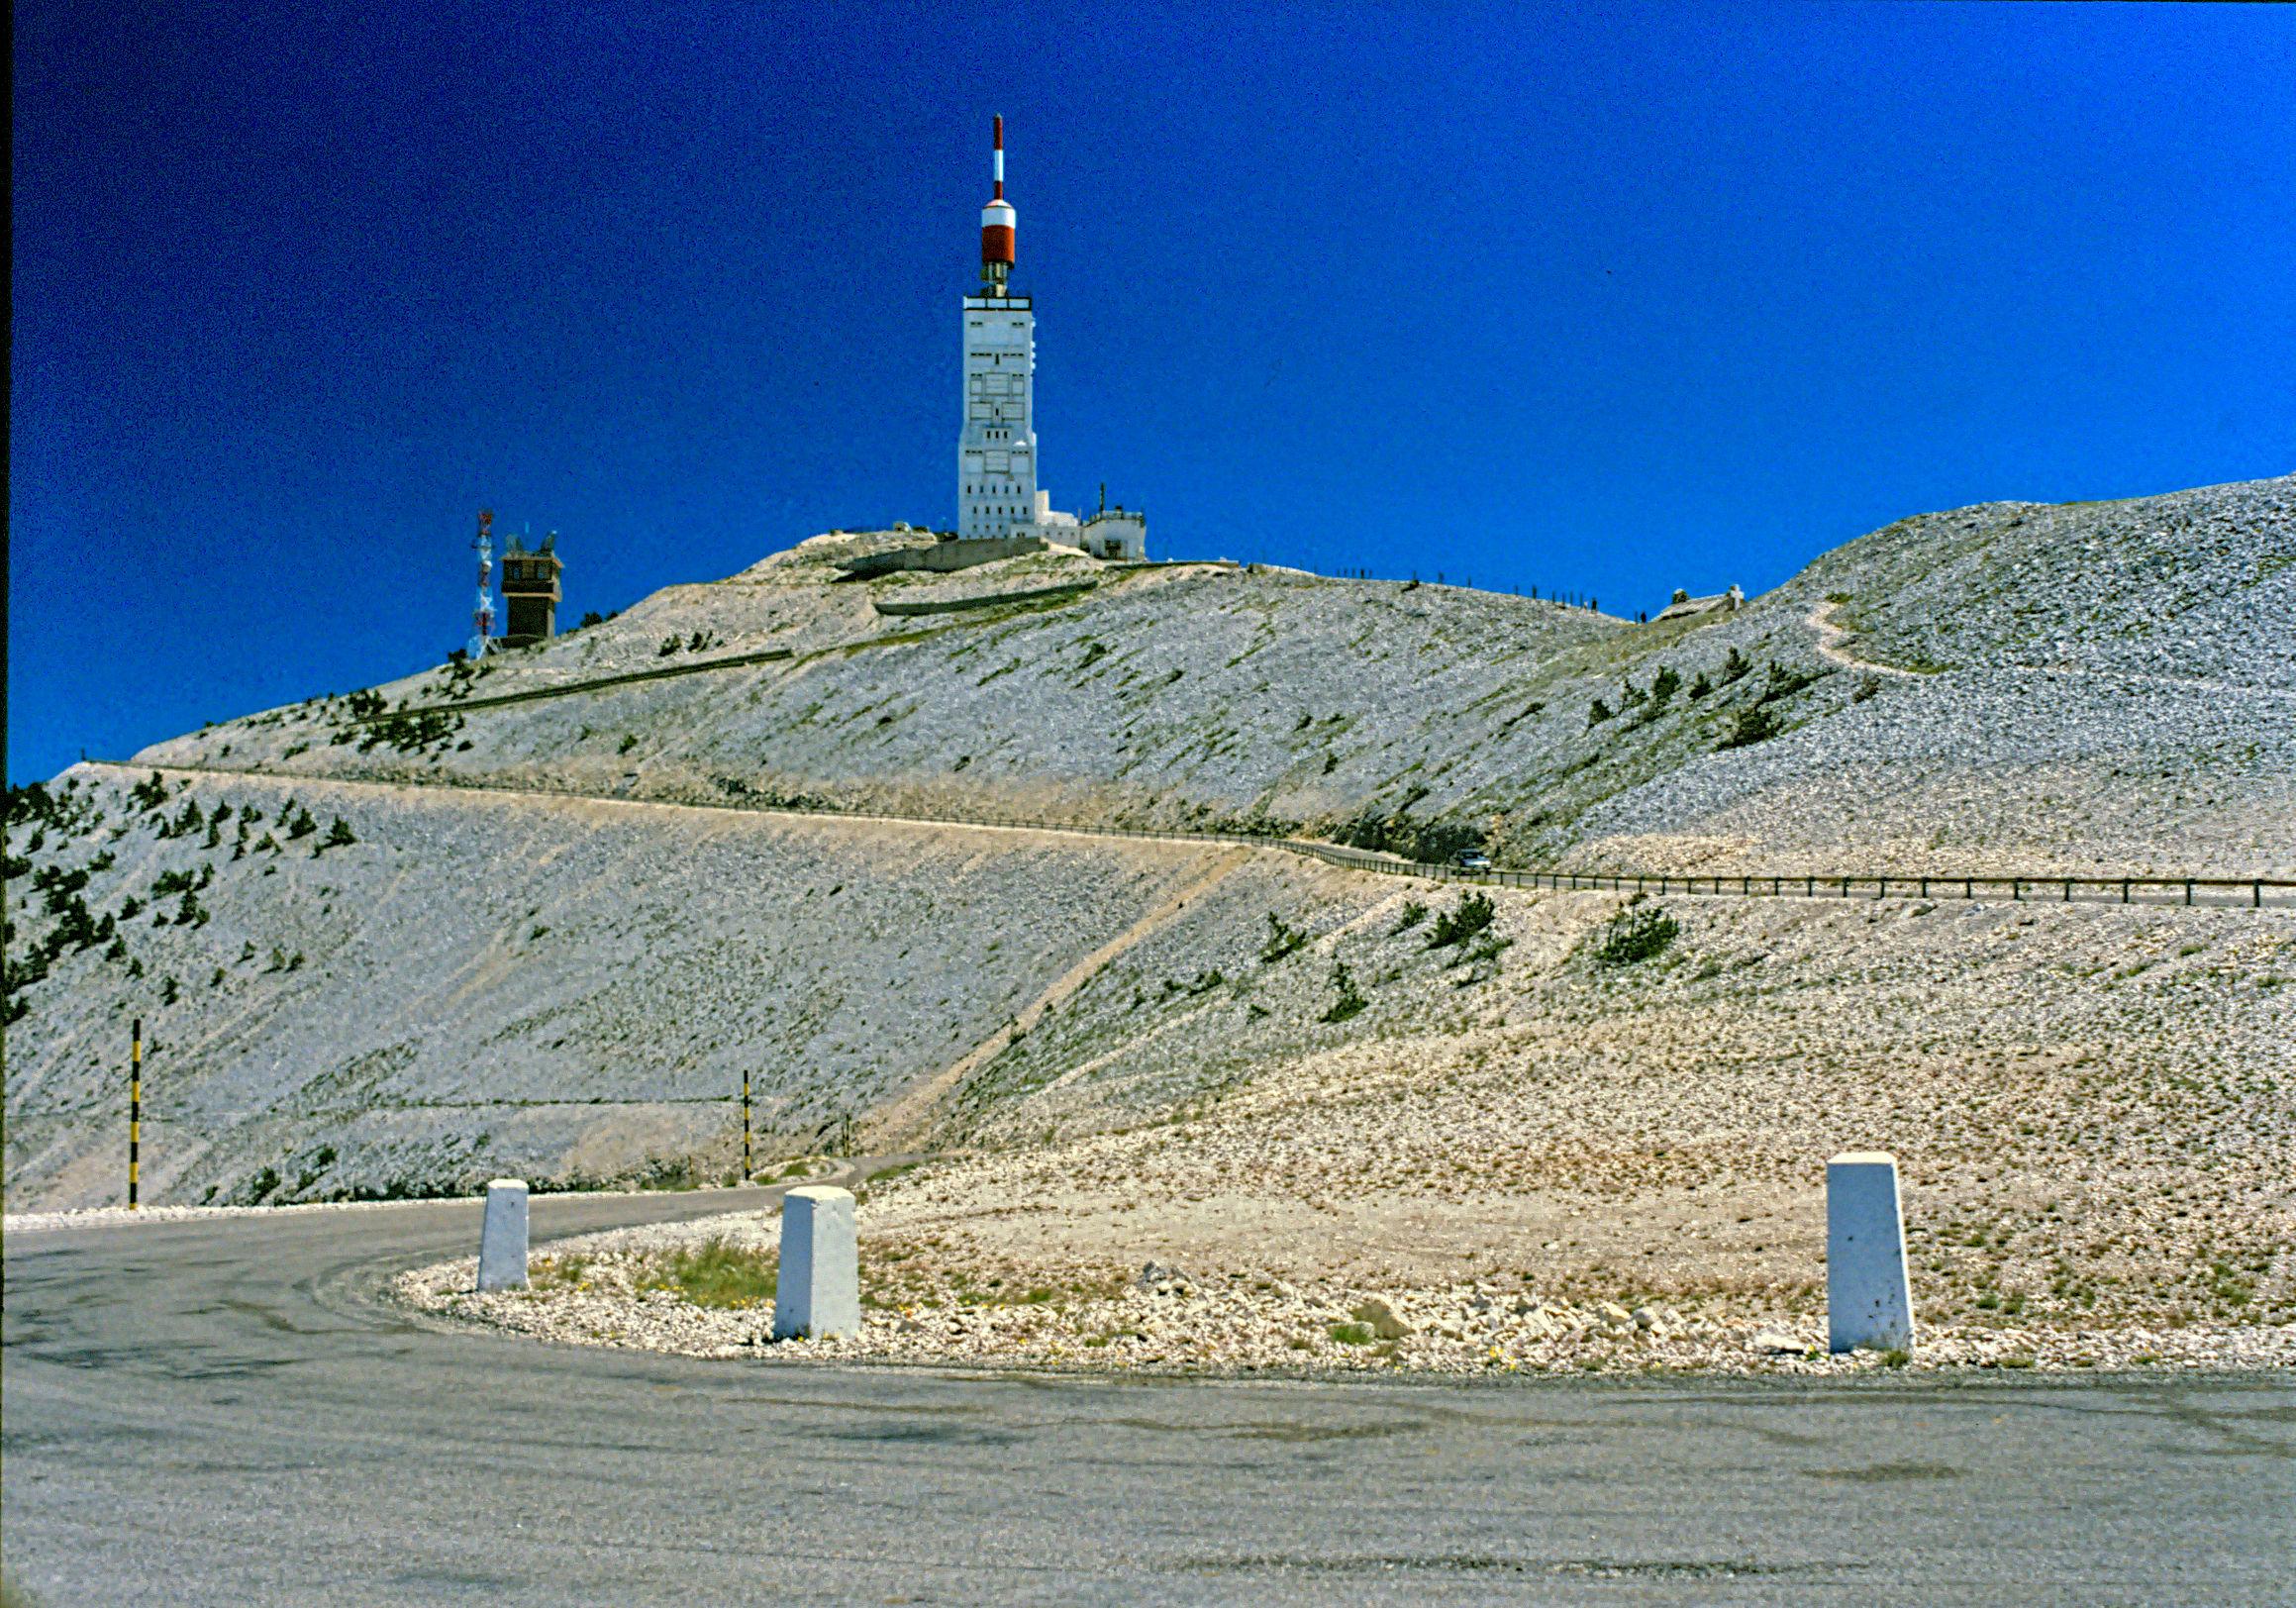 http://upload.wikimedia.org/wikipedia/commons/9/96/Mont_ventoux_summit.jpg